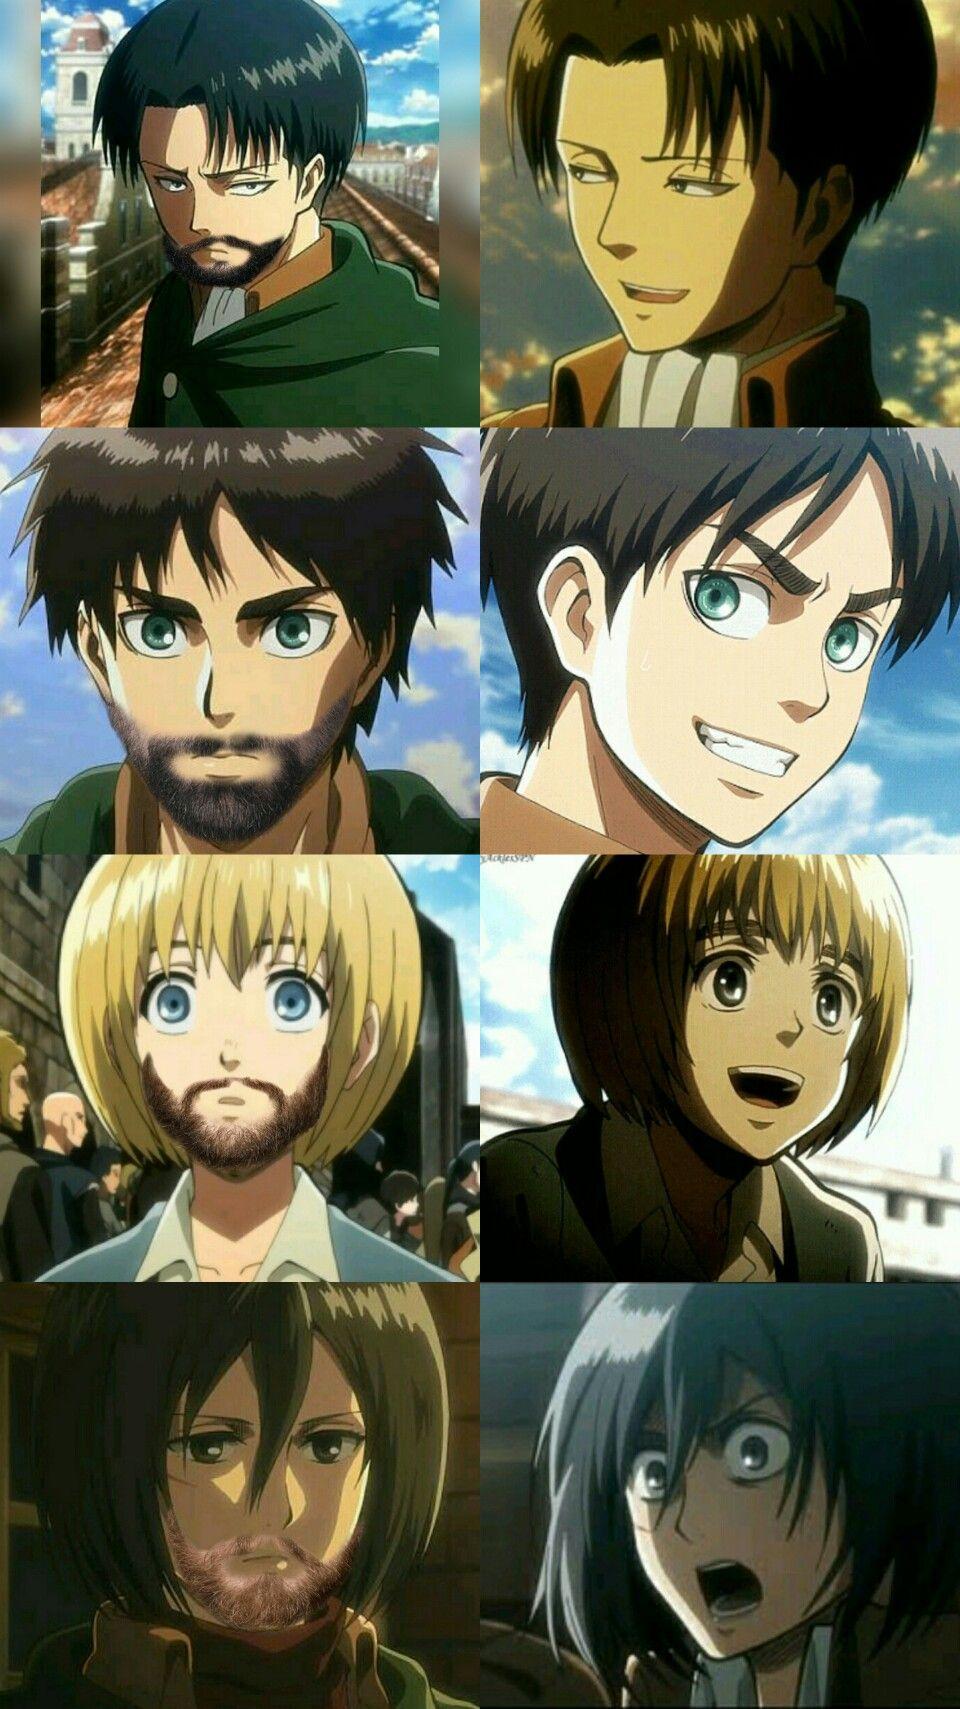 AOT Funny 1 Attack on titan funny, Anime memes funny